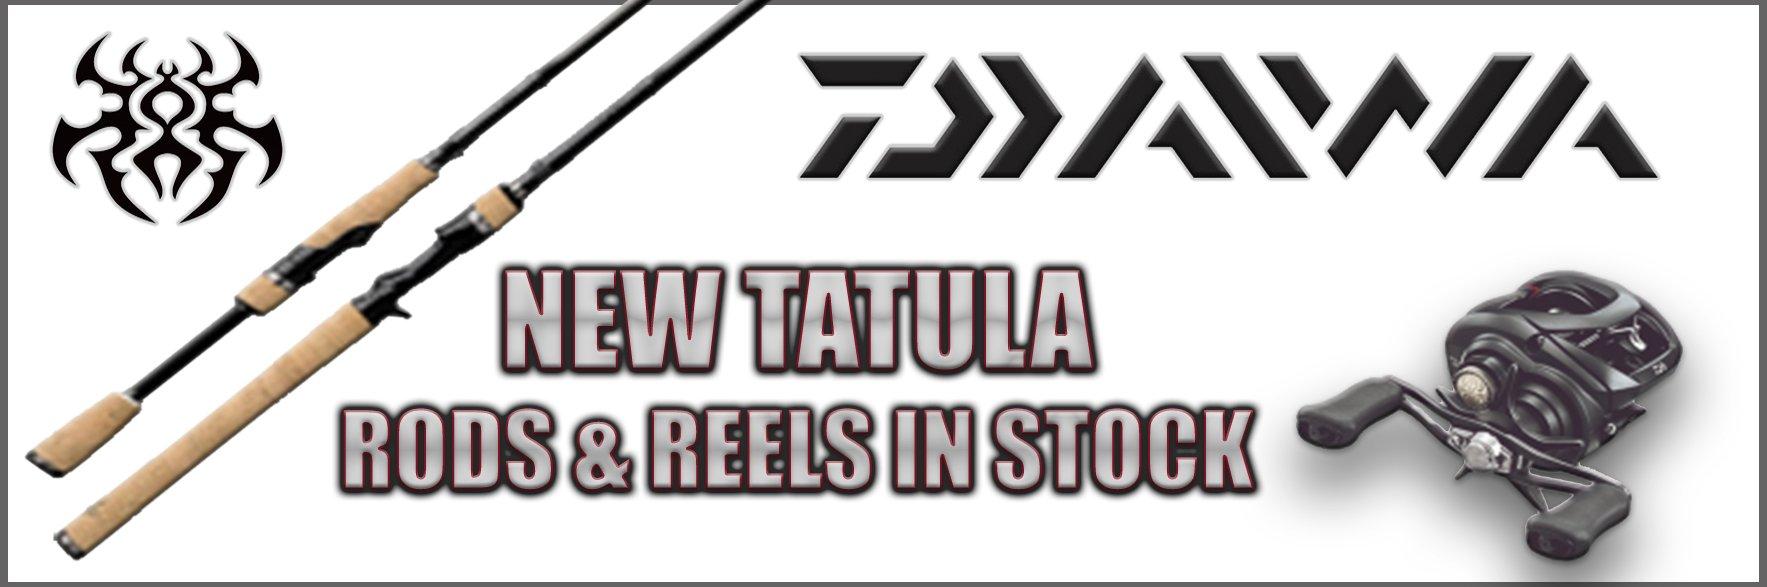 2018 New Daiwa Tatula Rods & Reels - Regular - Medium Heavy